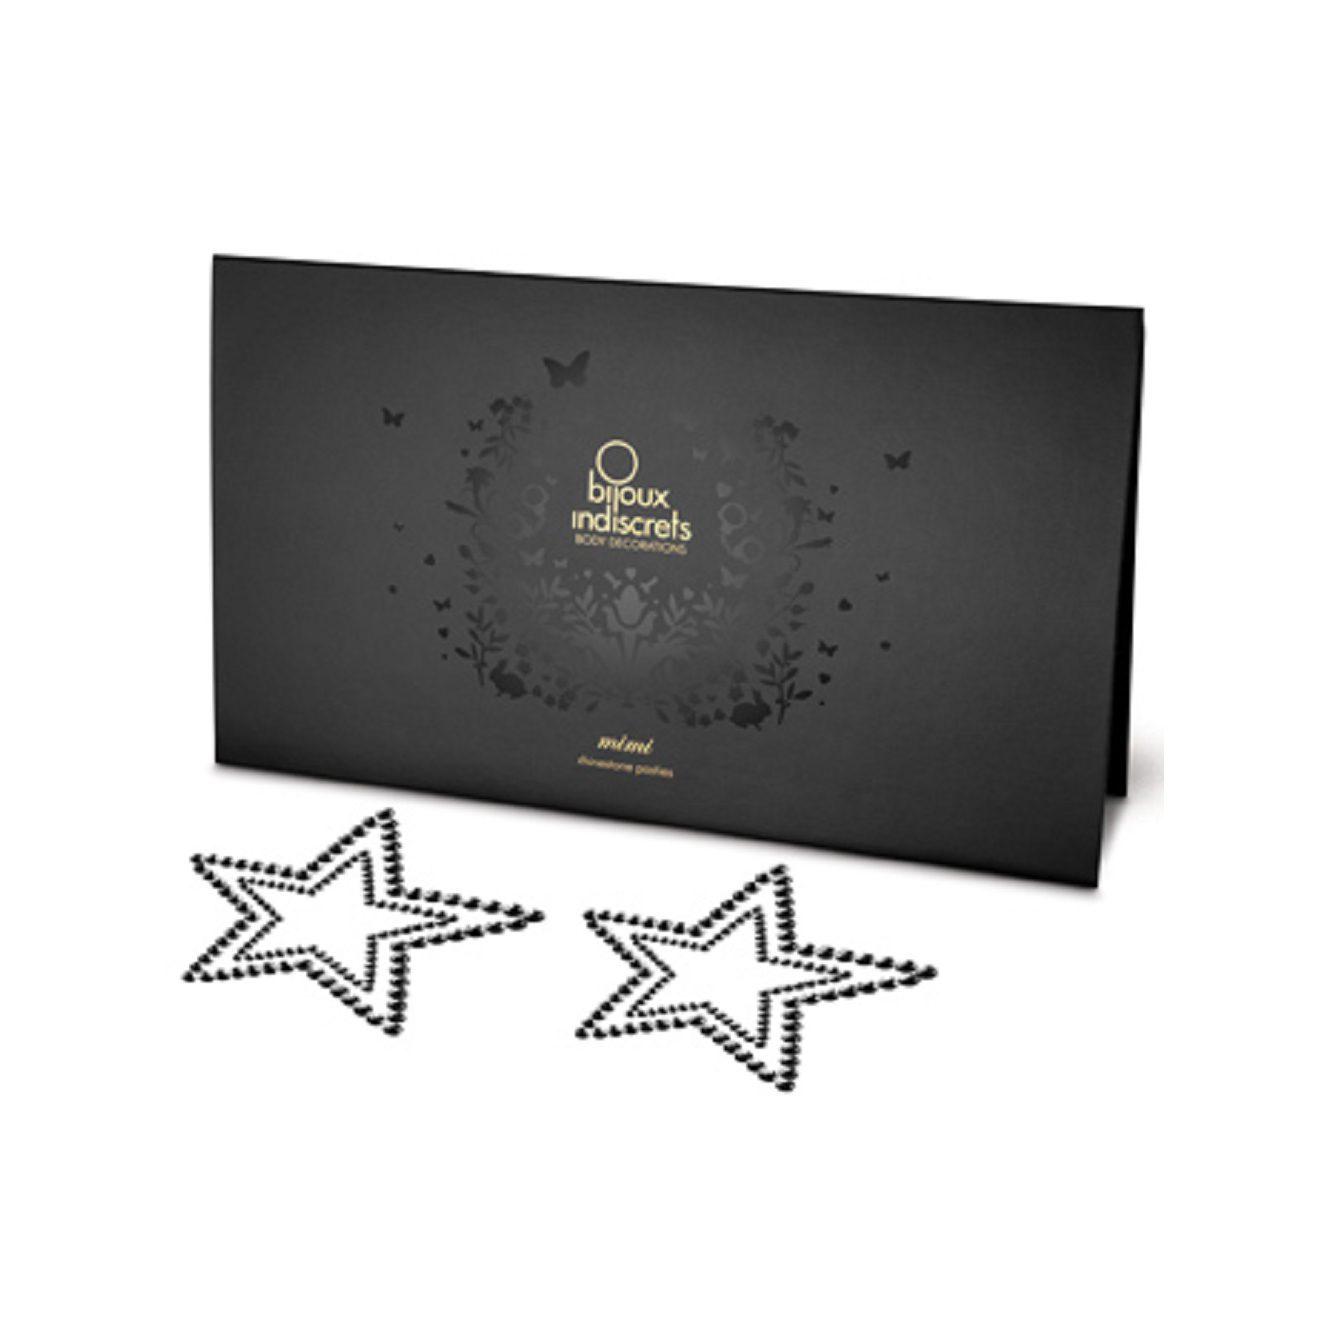 Mimi Cubre Pezones Sexys Estrellas Piedras Negras /Mimi Star Rhinestone Pasties de Bijoux Indiscret - LOVERSpack